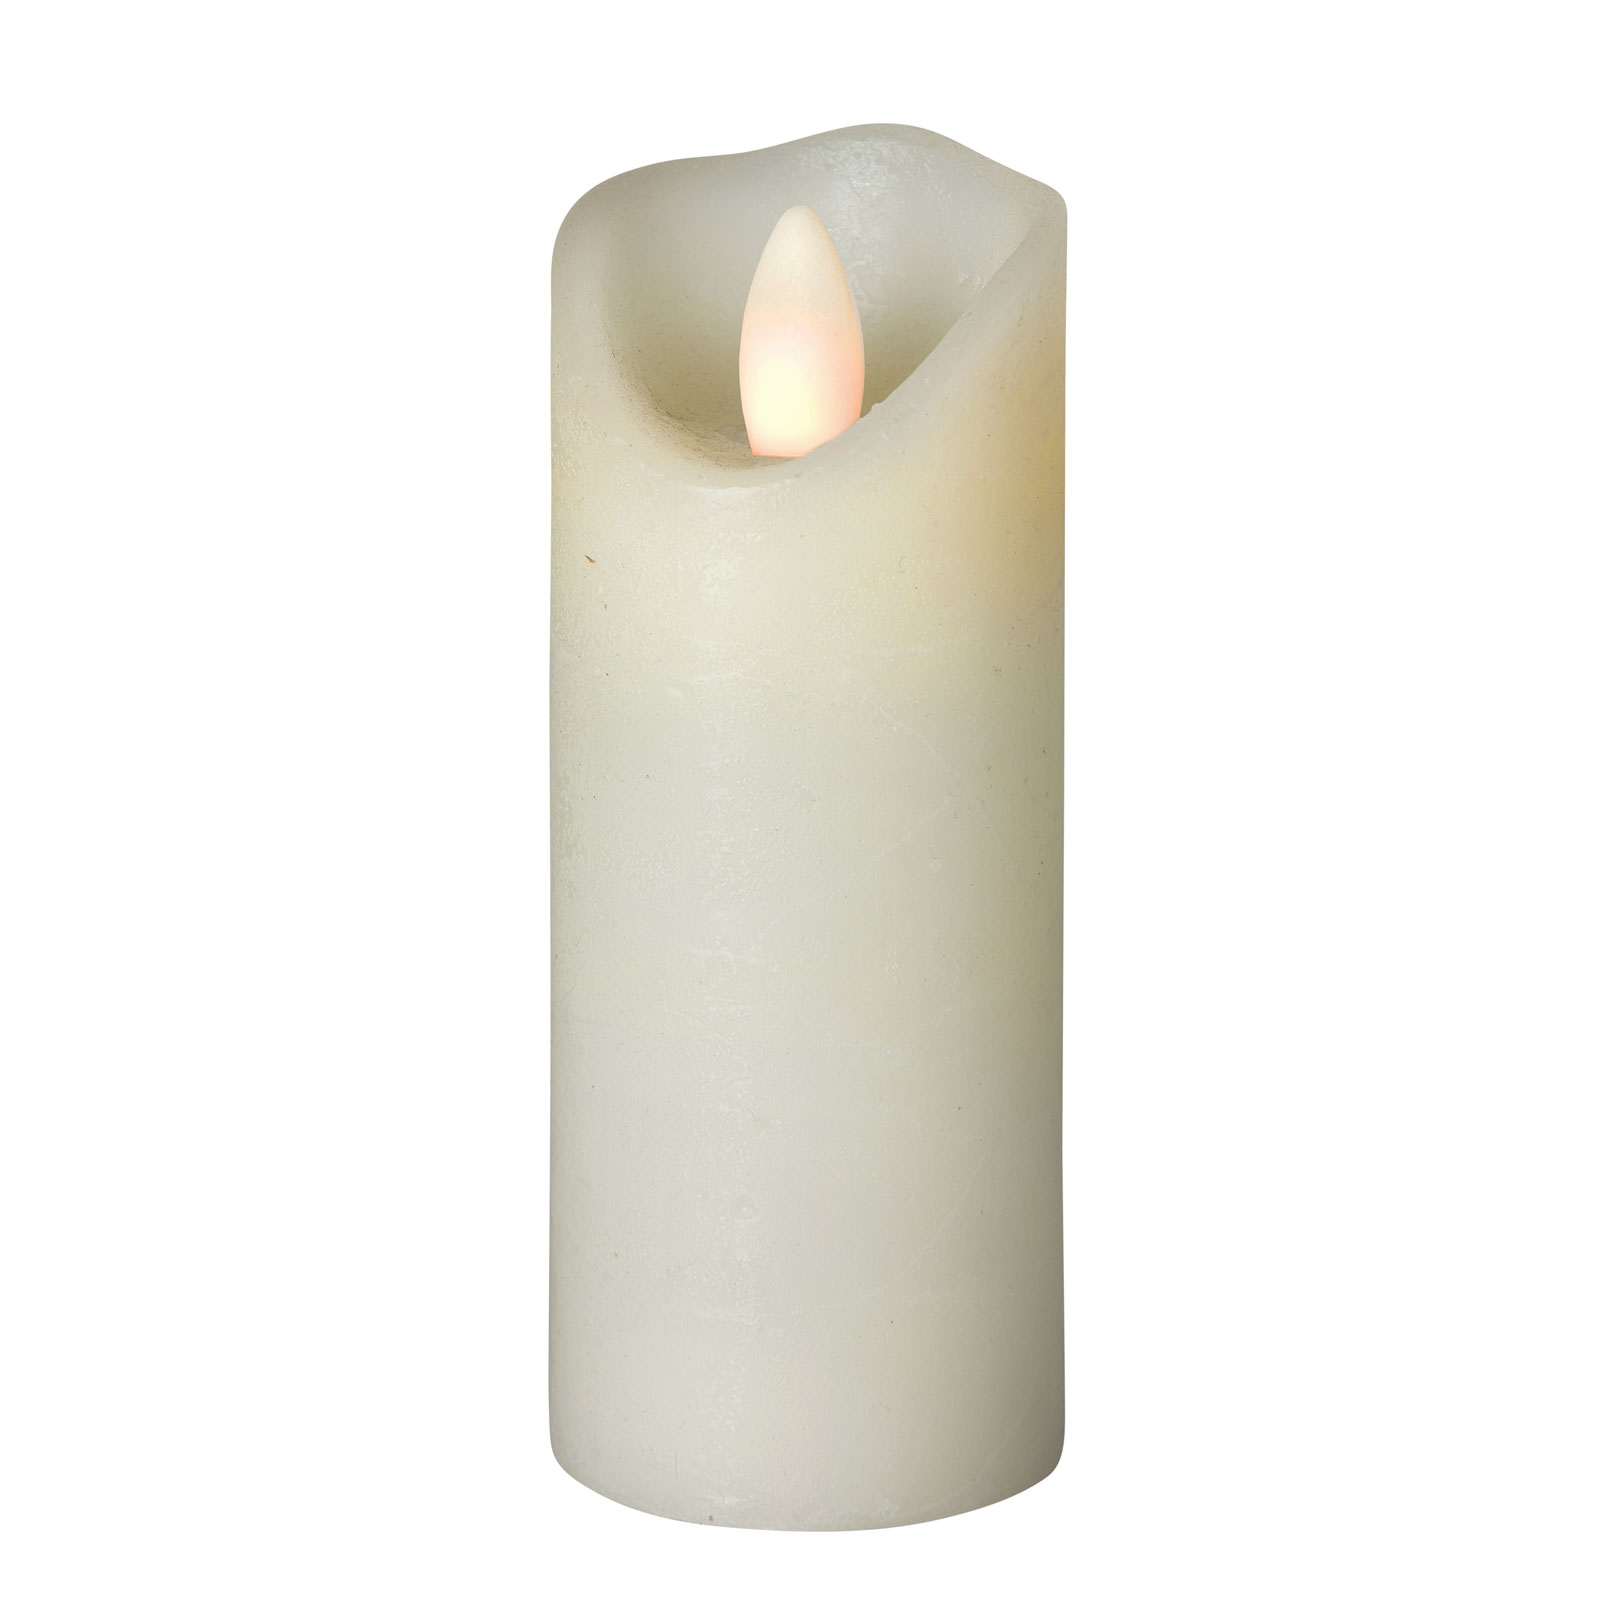 LED-Kerze Shine, Ø 5 cm, elfenbein, Höhe 15 cm